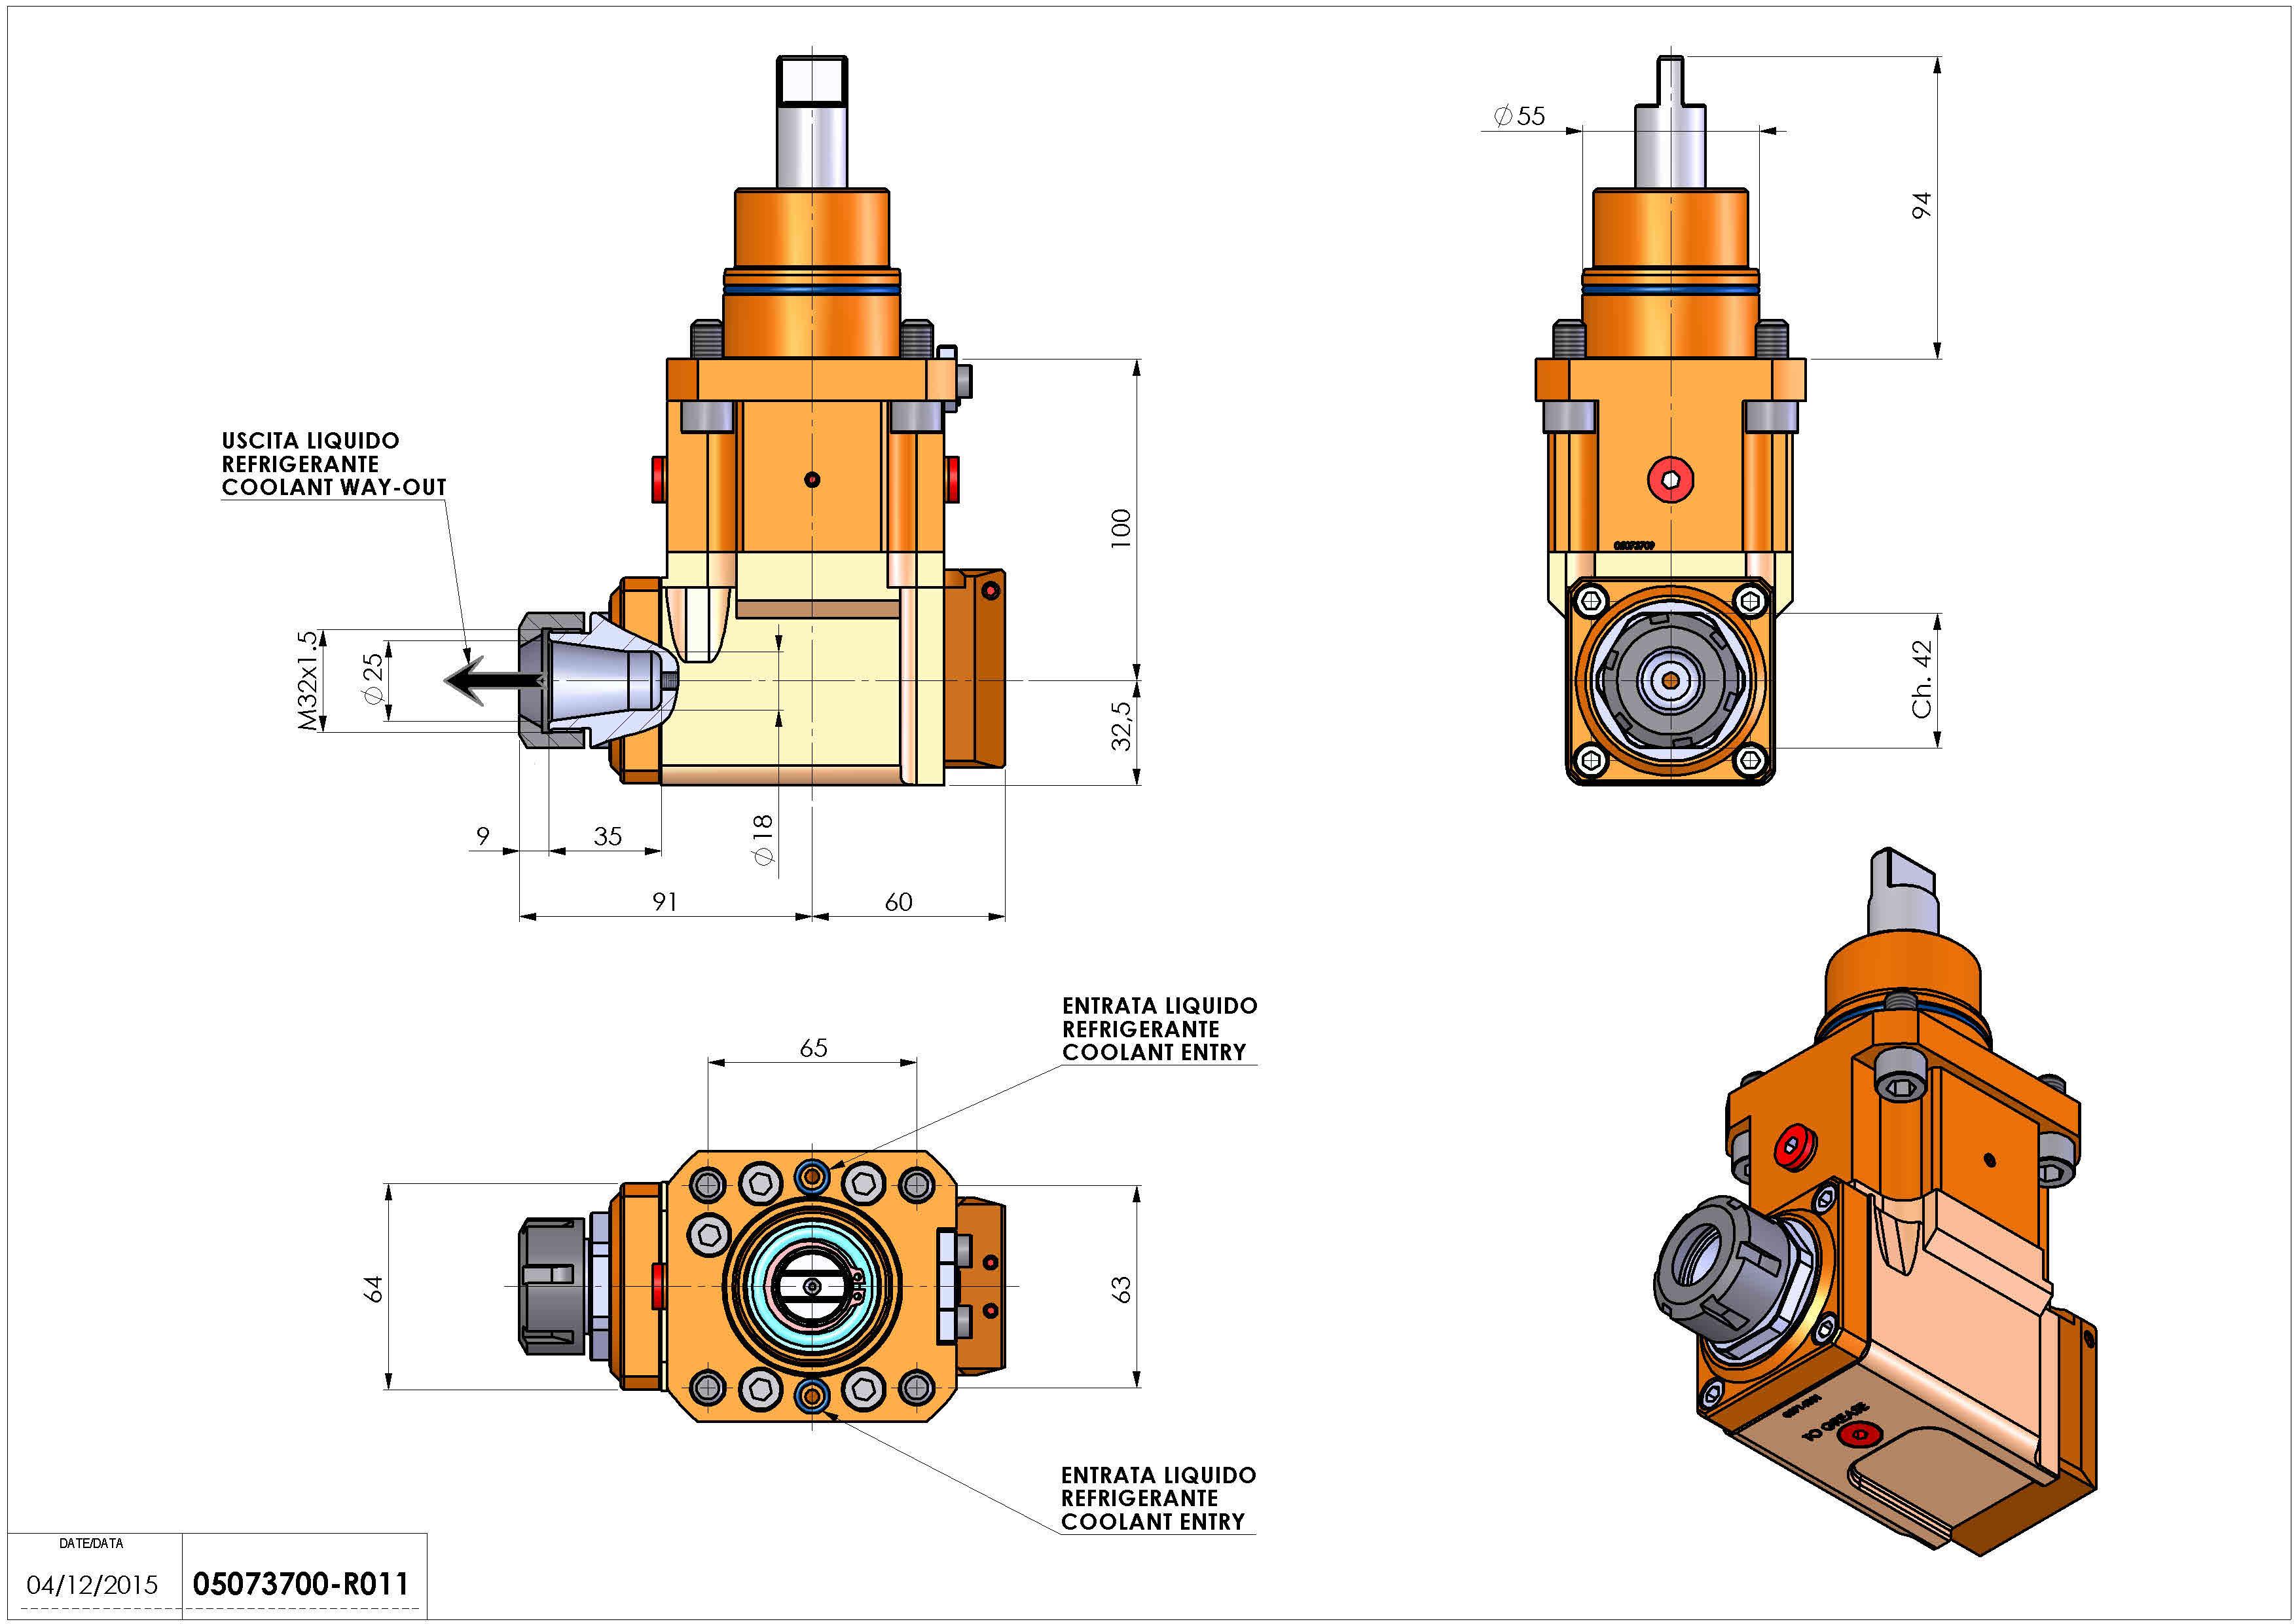 Technical image - LT-A D55 ER25 LR RF H100 BI.